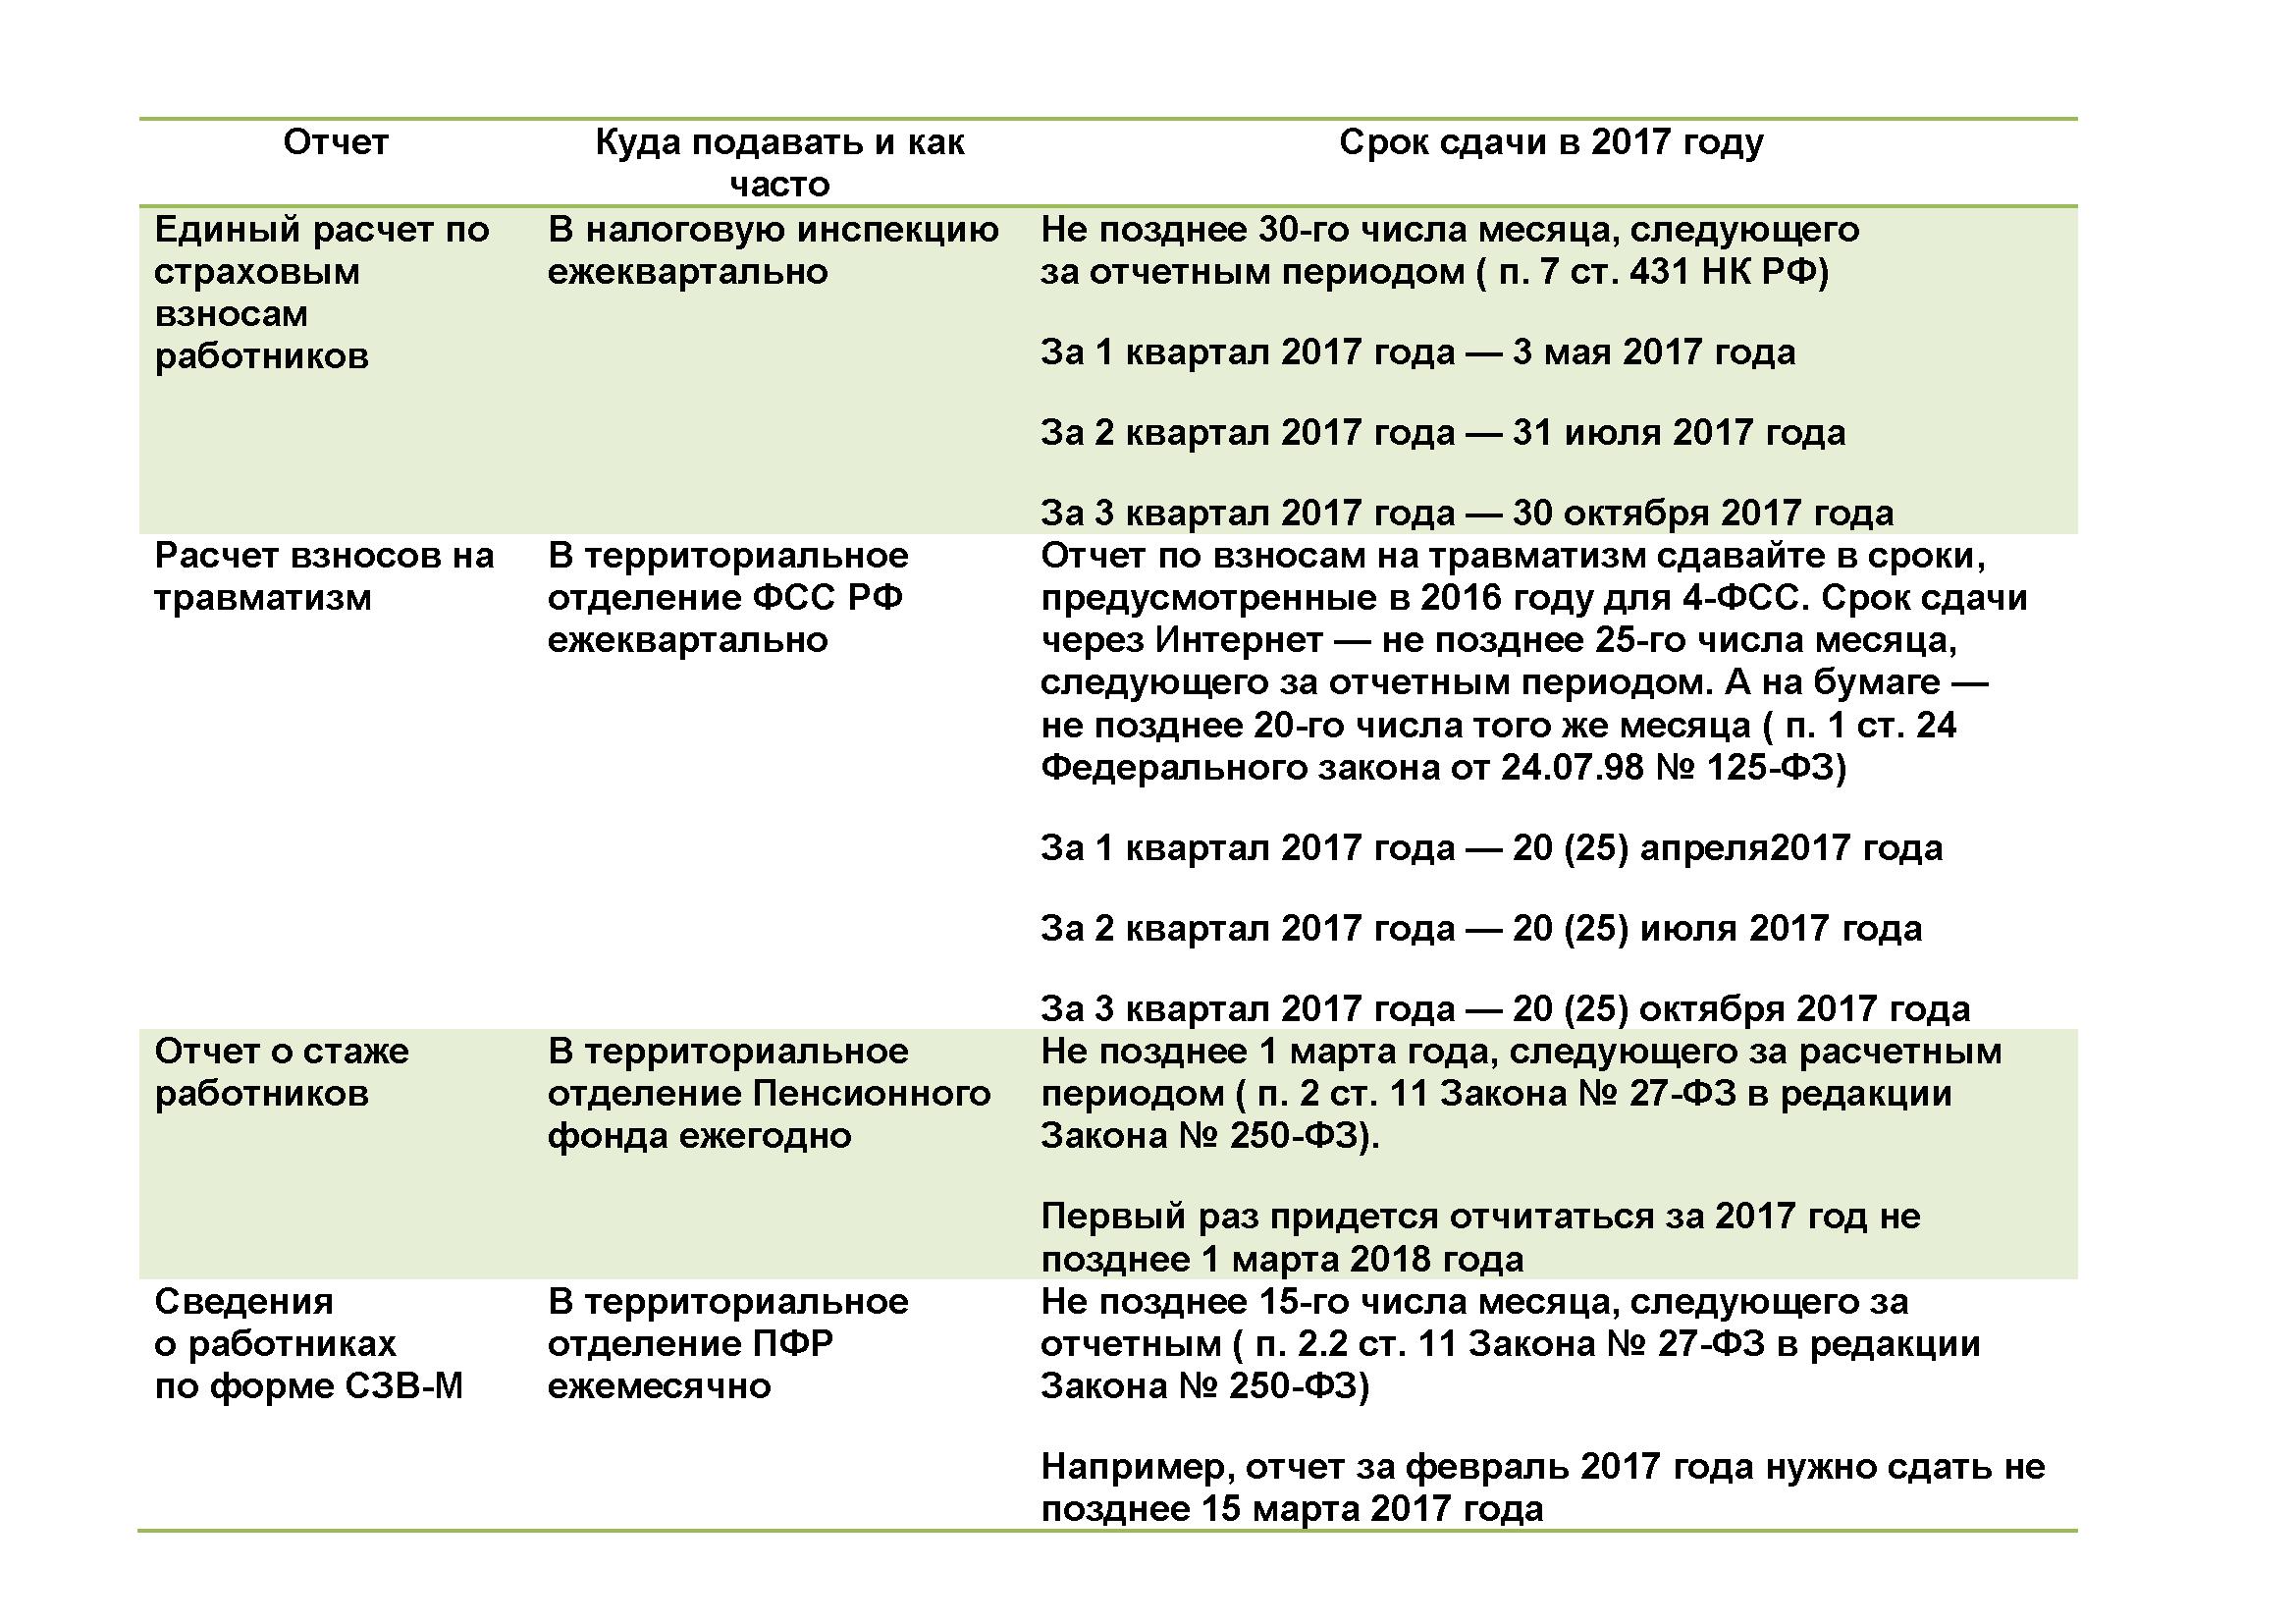 Сроки сдачи отчетности по страховым взносам с 2017 года: таблица